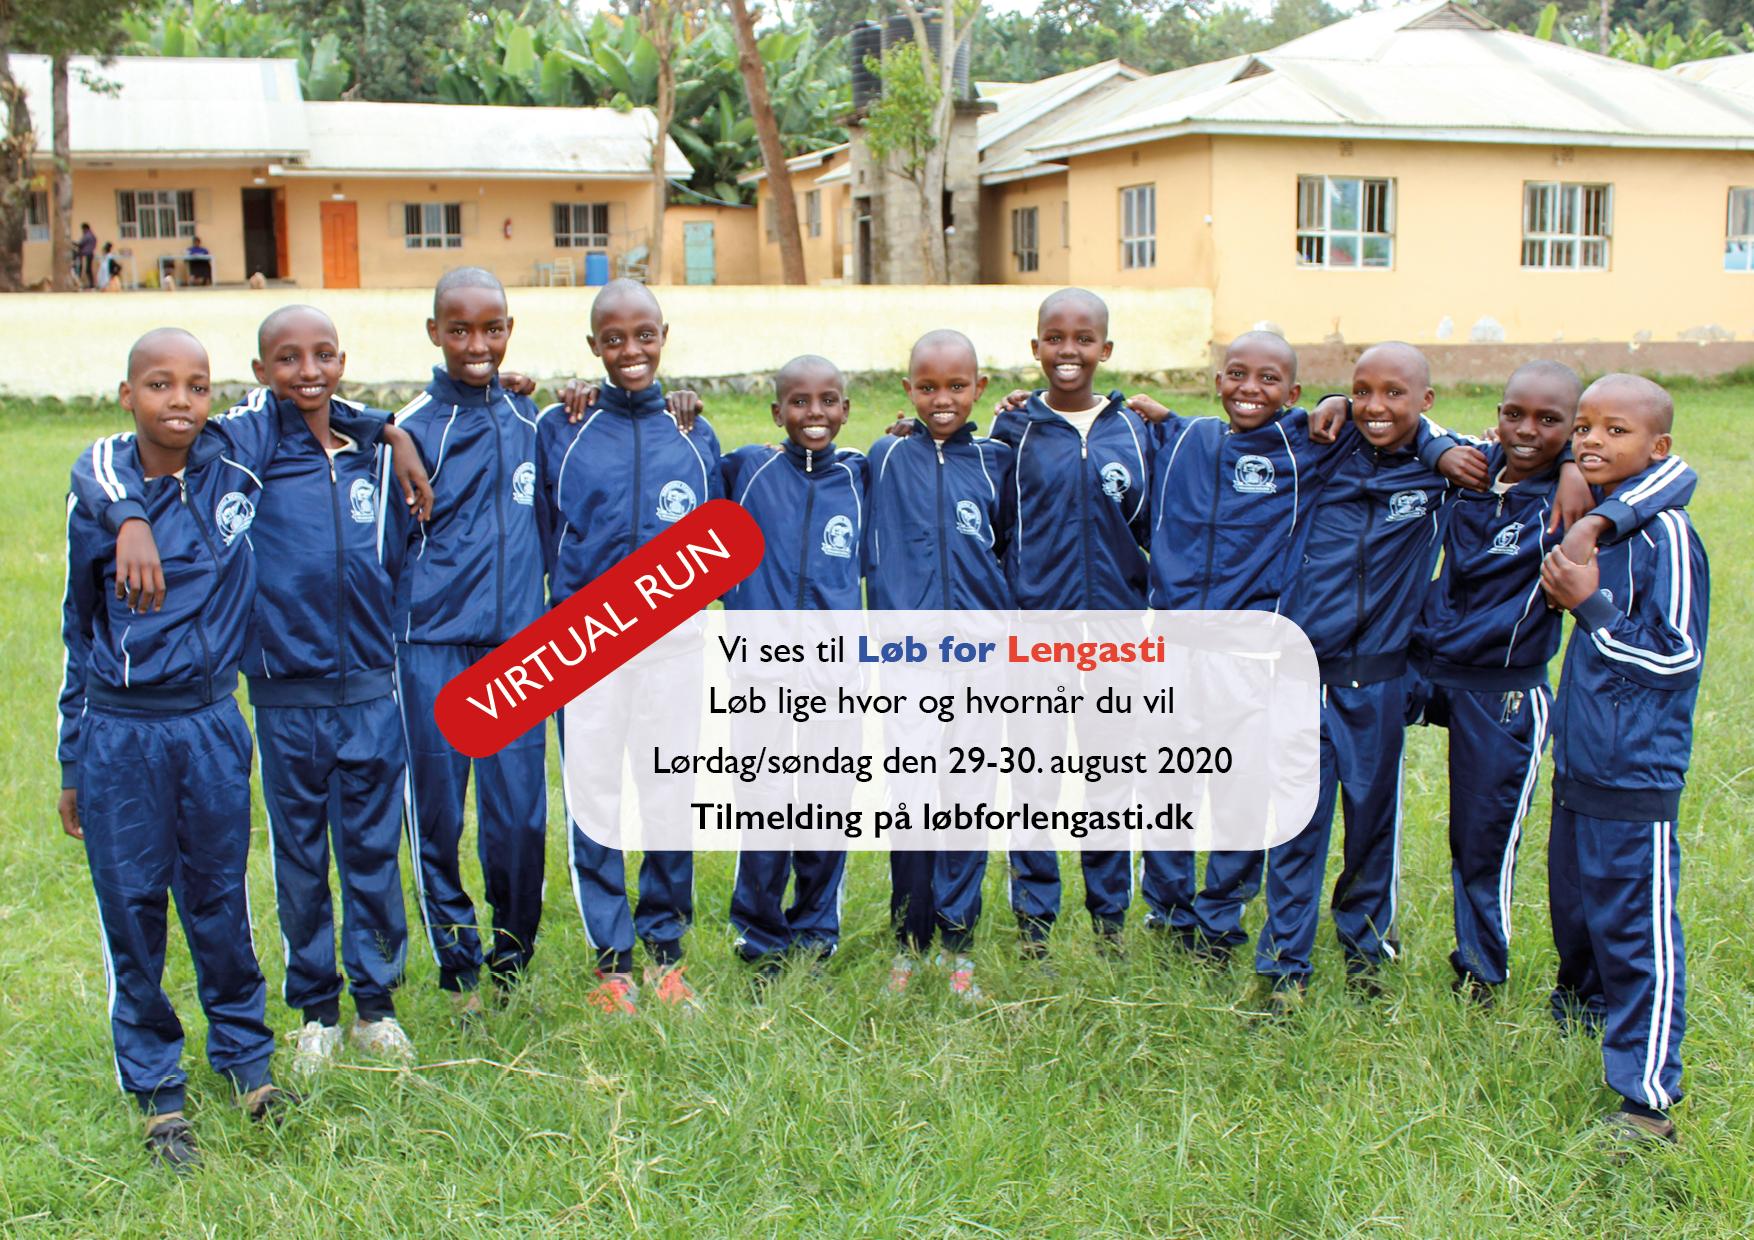 Løb for Lengasti 2020 (Virtual Run for velgørenhed)